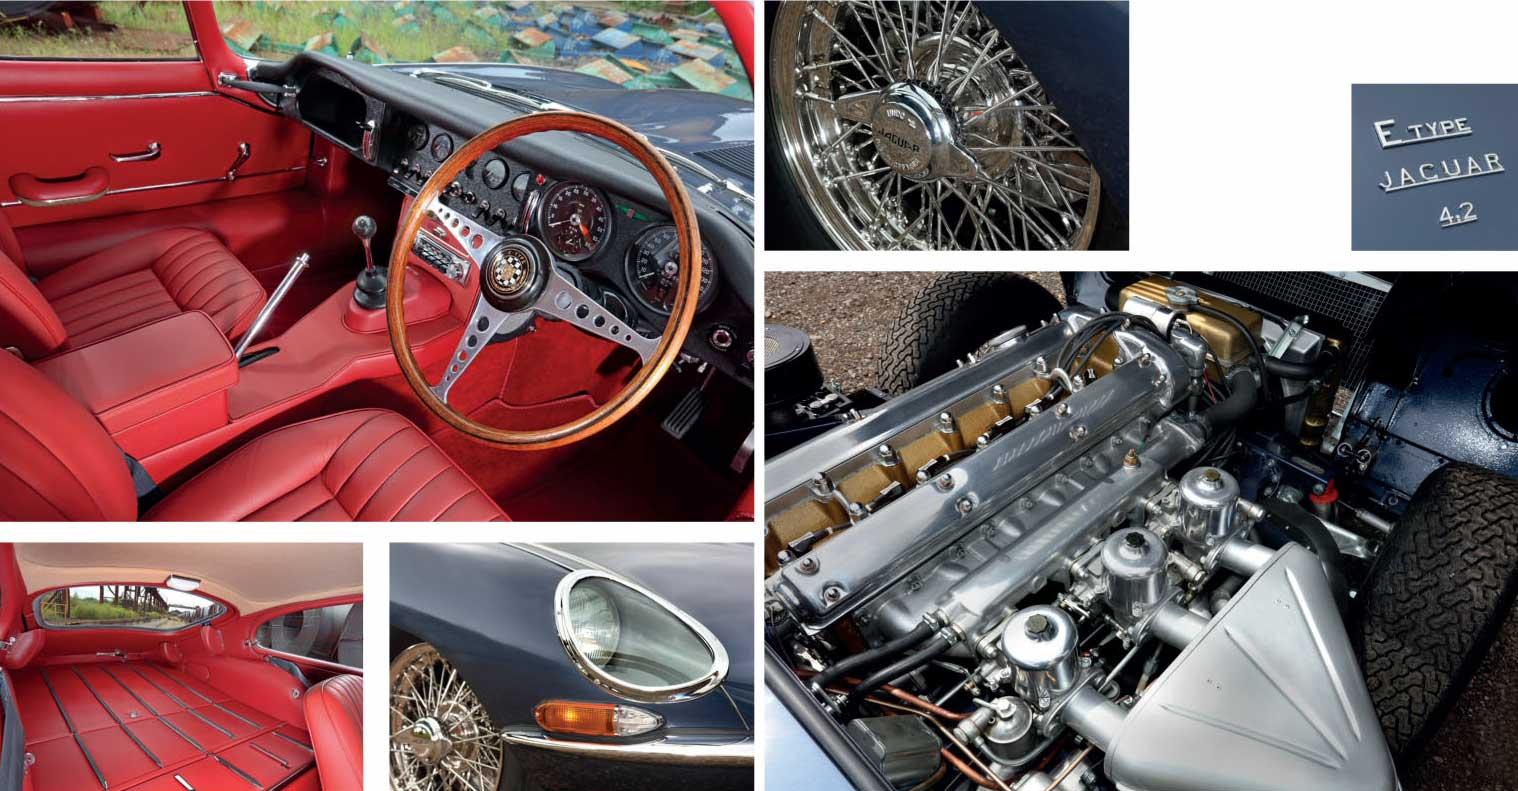 Epic jaguar e type restored drive my blogs drive epic jaguar e type restoration pooptronica